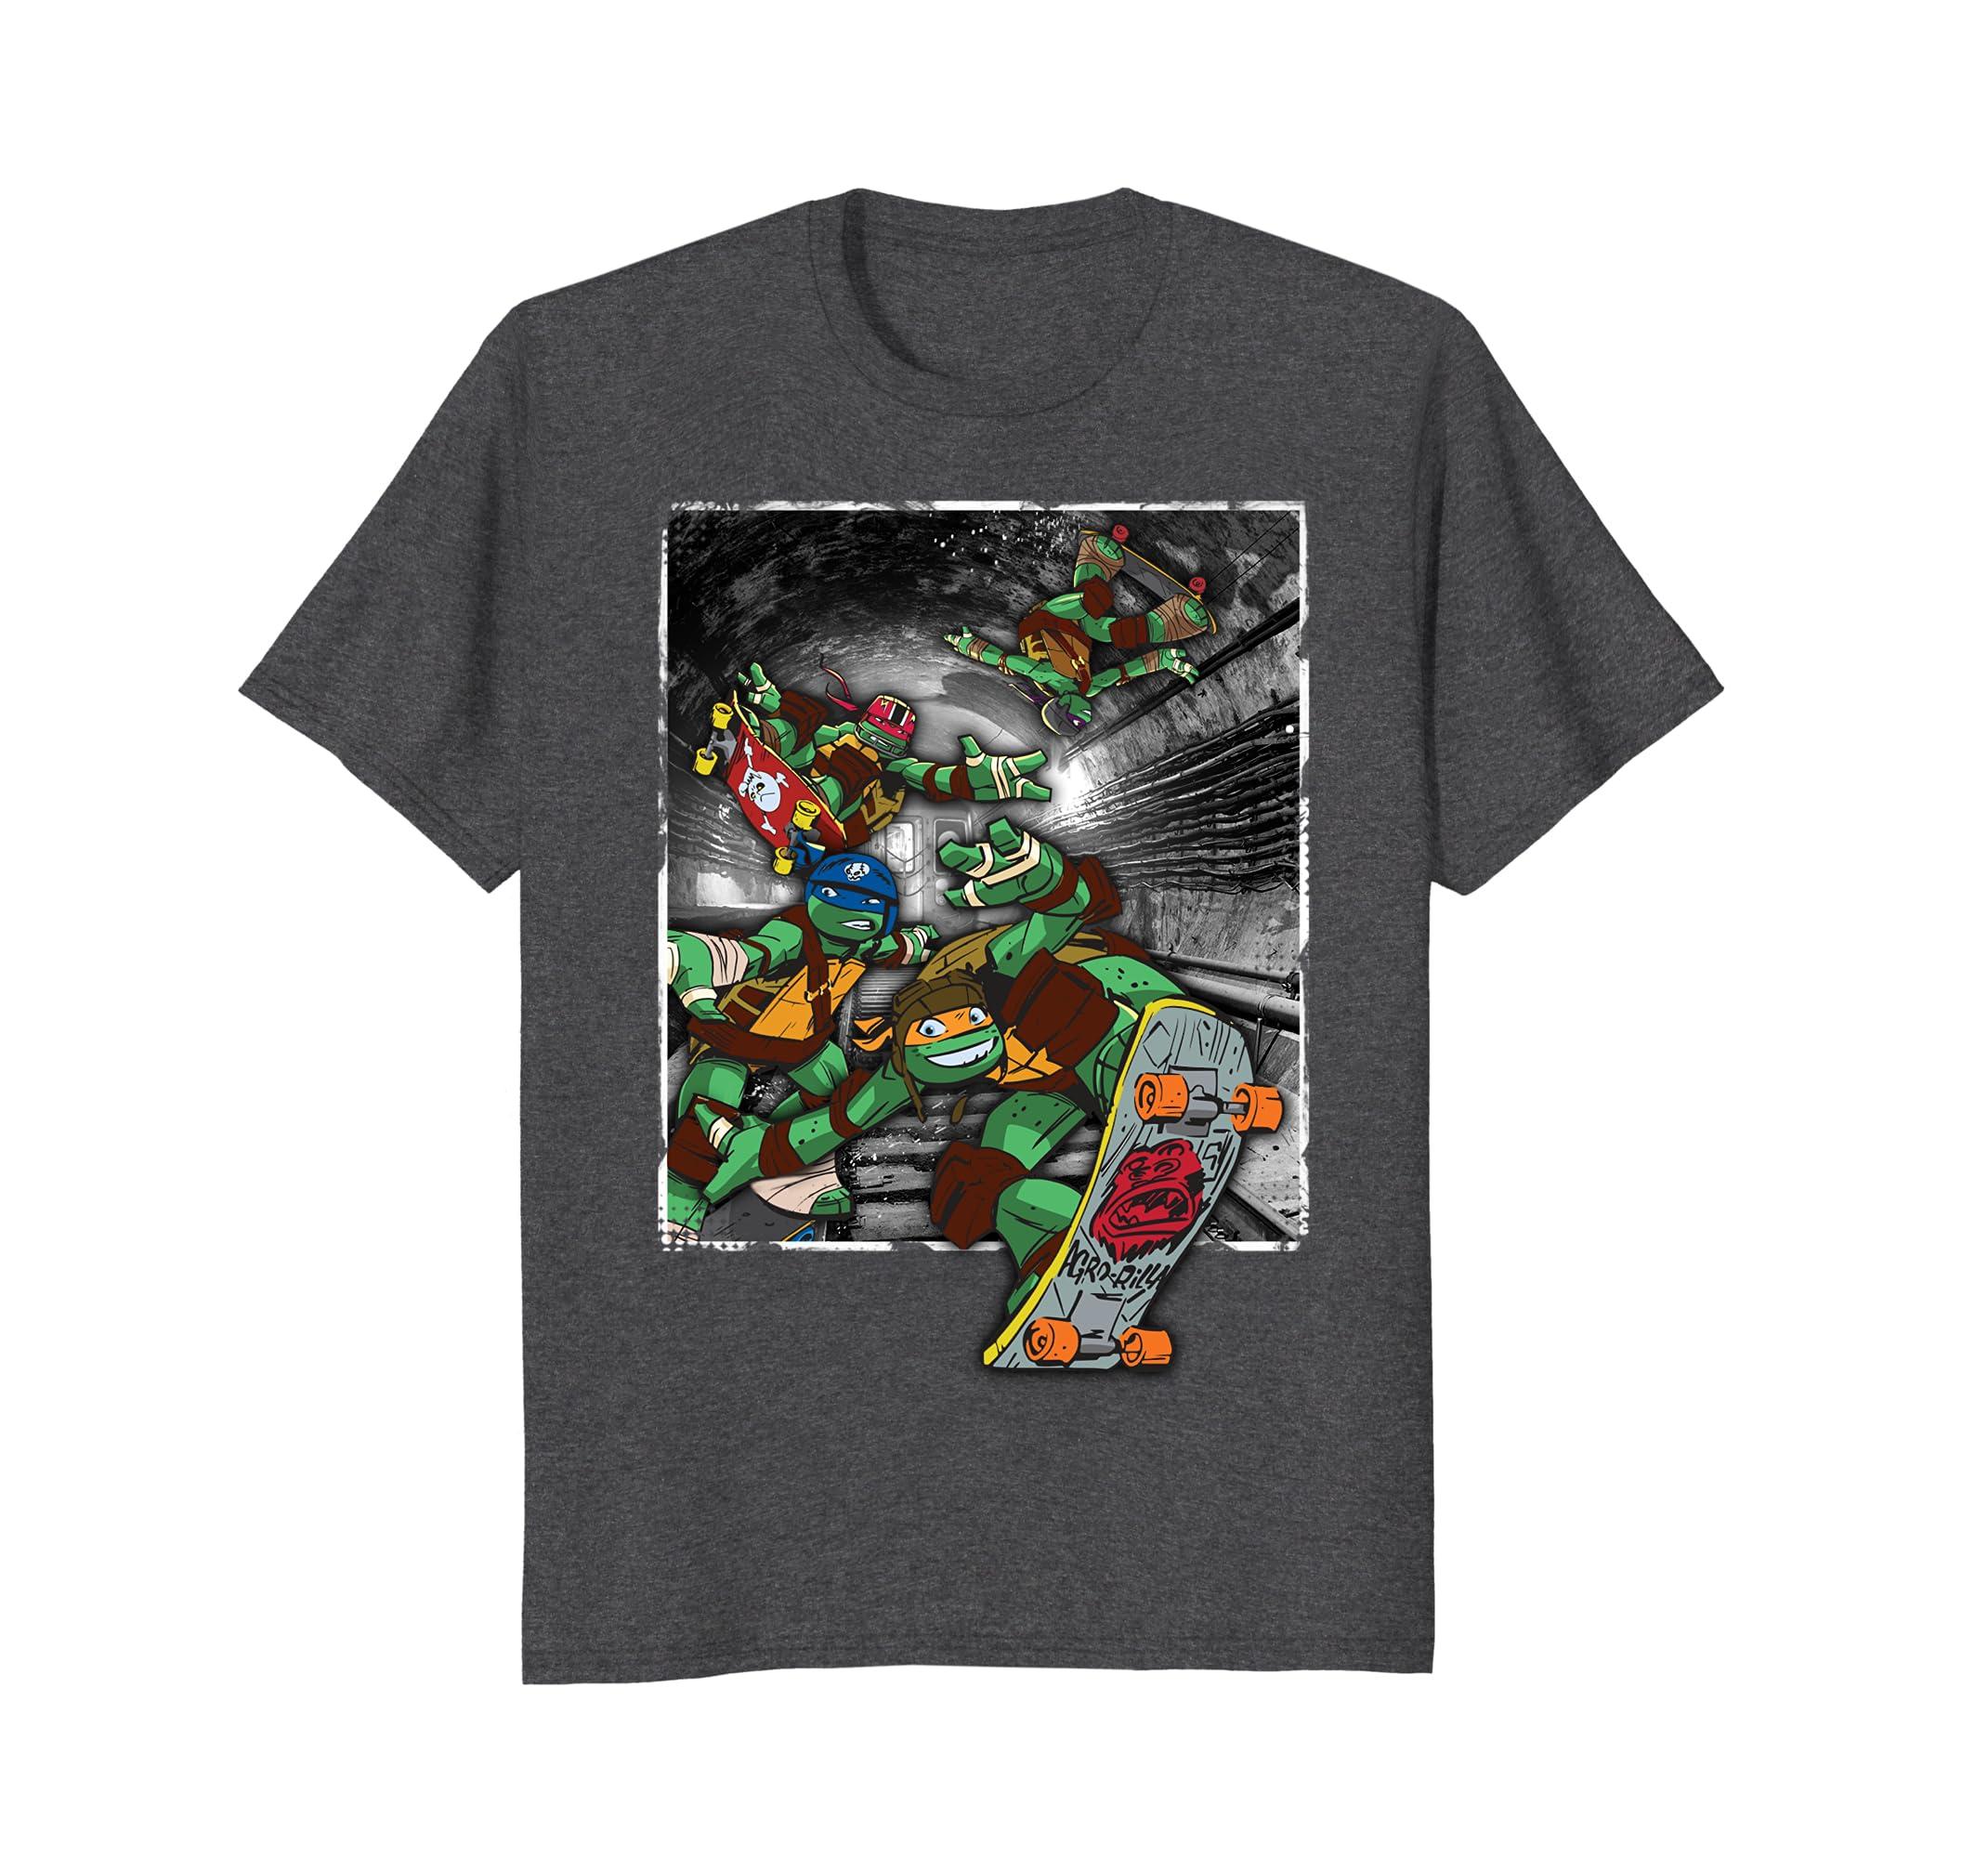 Amazon.com: Teenage Mutant Ninja Turtles Subway Tunnel ...